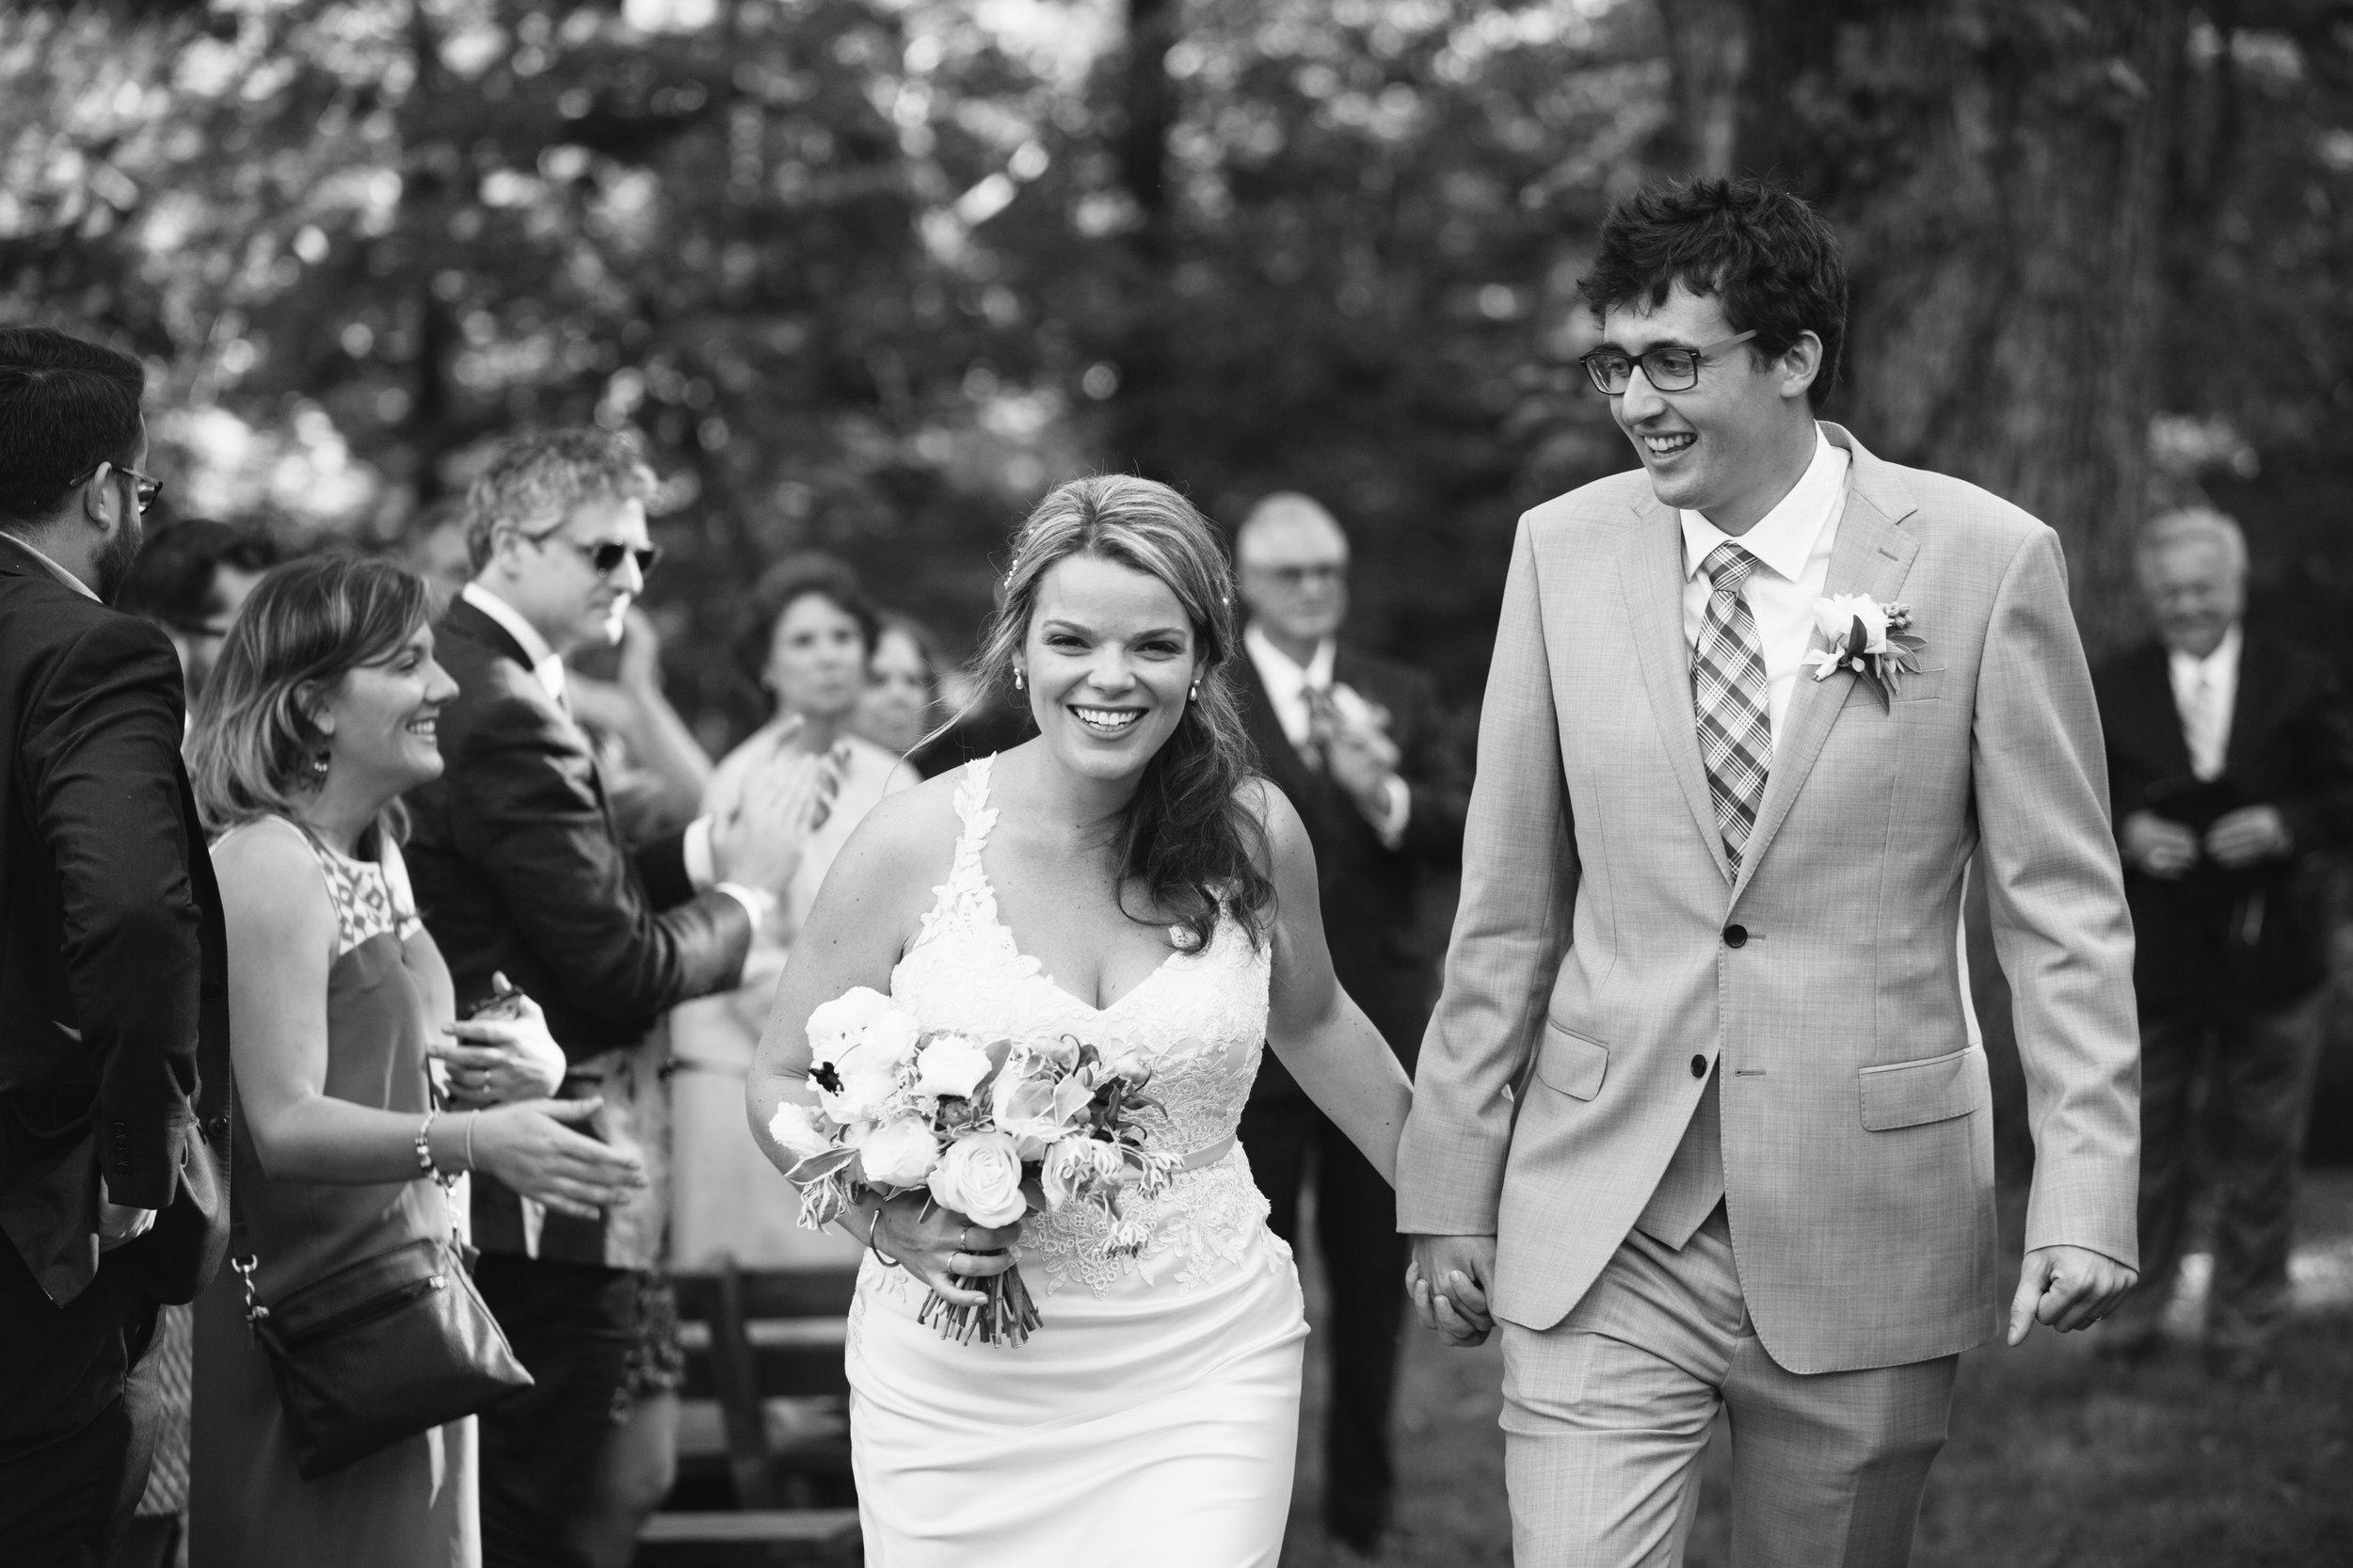 Abby_Simon_Wedding_Abigail_Malone_Photography_nashville_Bloomsbury_Farm-369.jpg